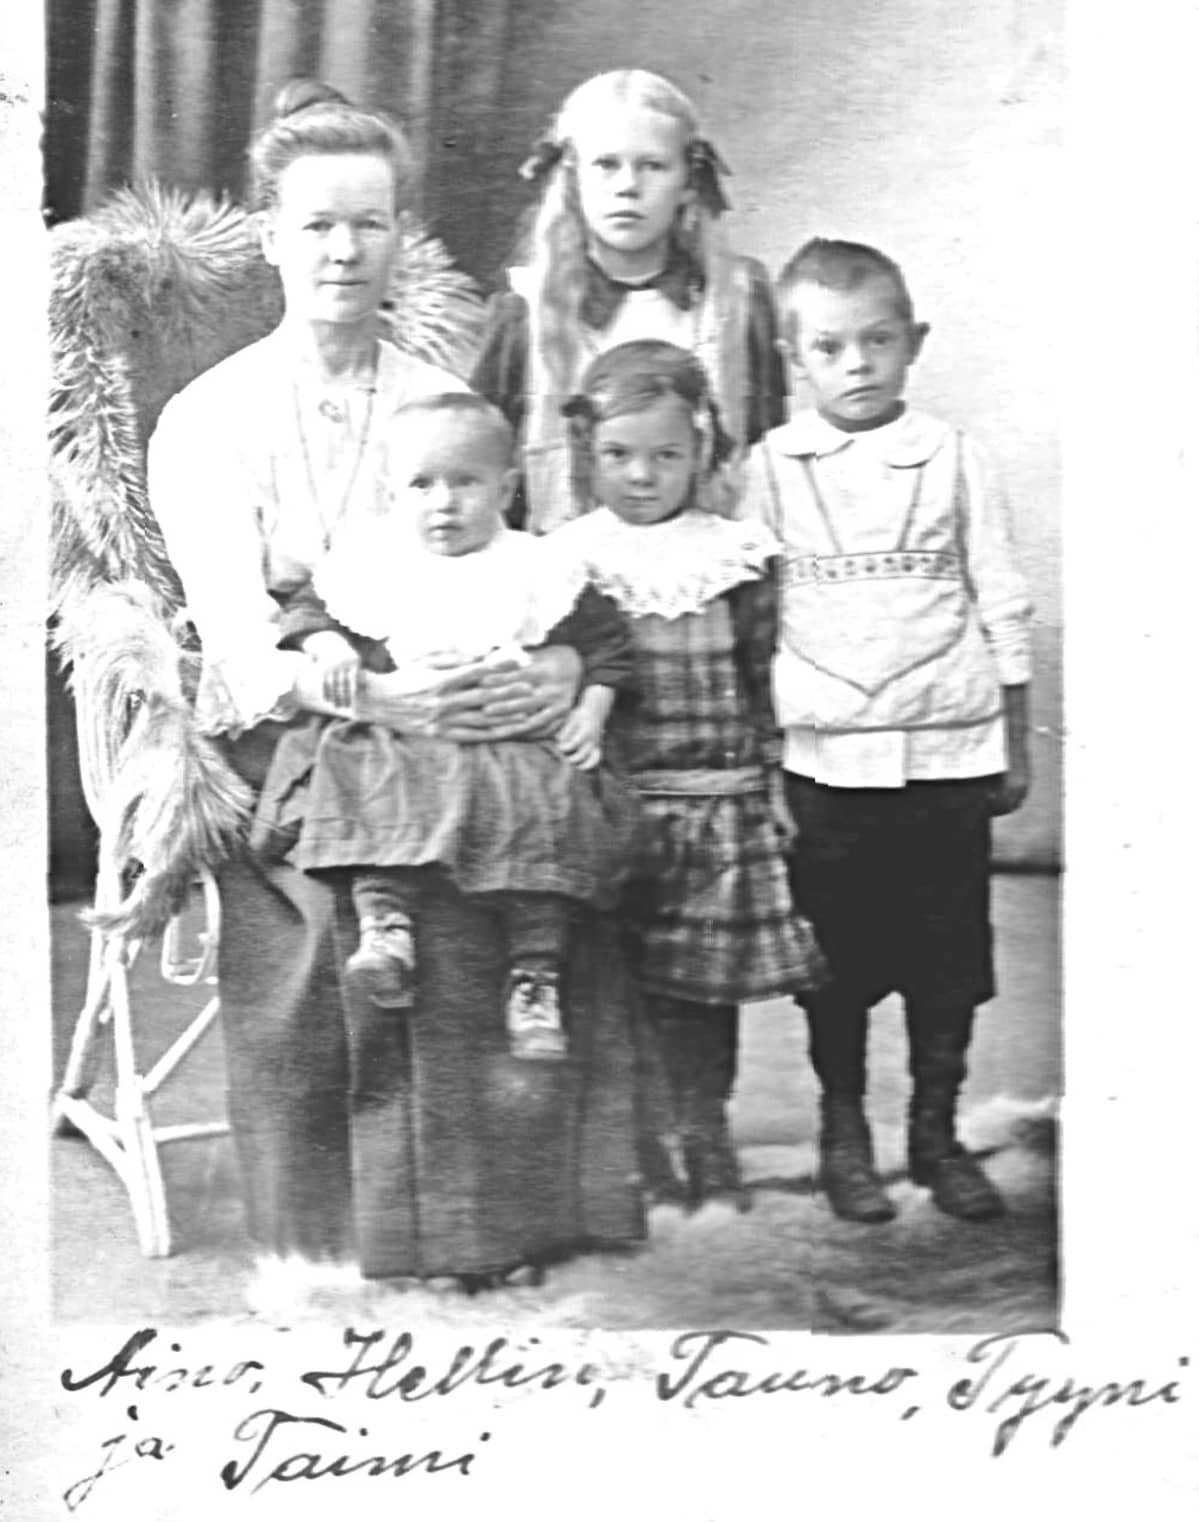 Aino Toivosen perhe